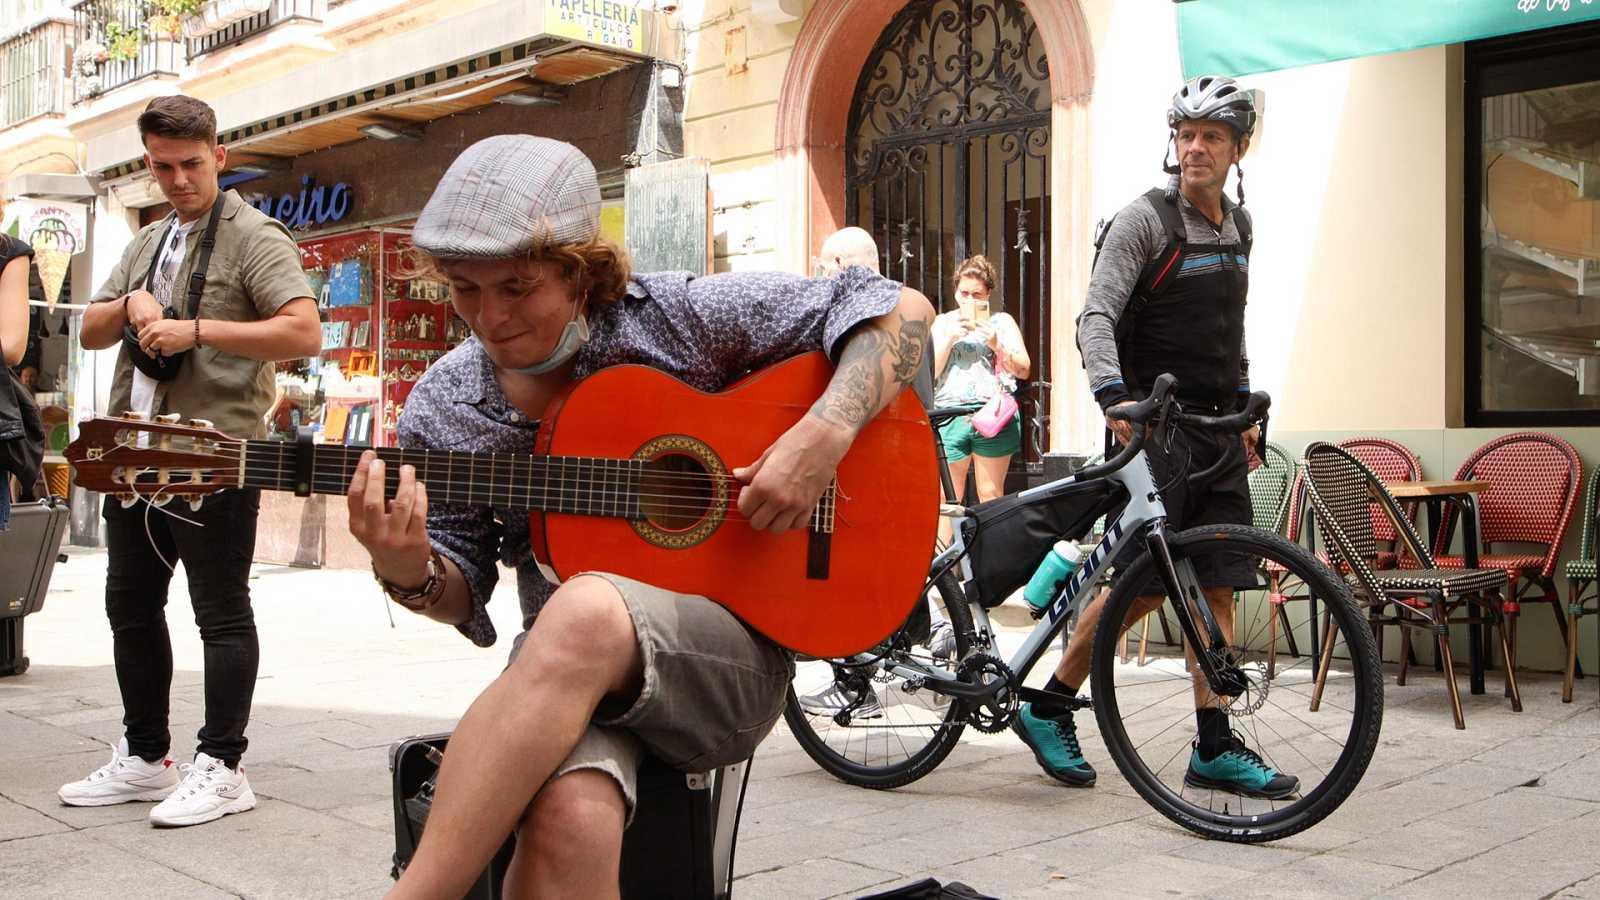 Ruta Vía de la Plata - Diario de un ciclista: Etapa 1. De Cádiz a Lebrija - ver ahora